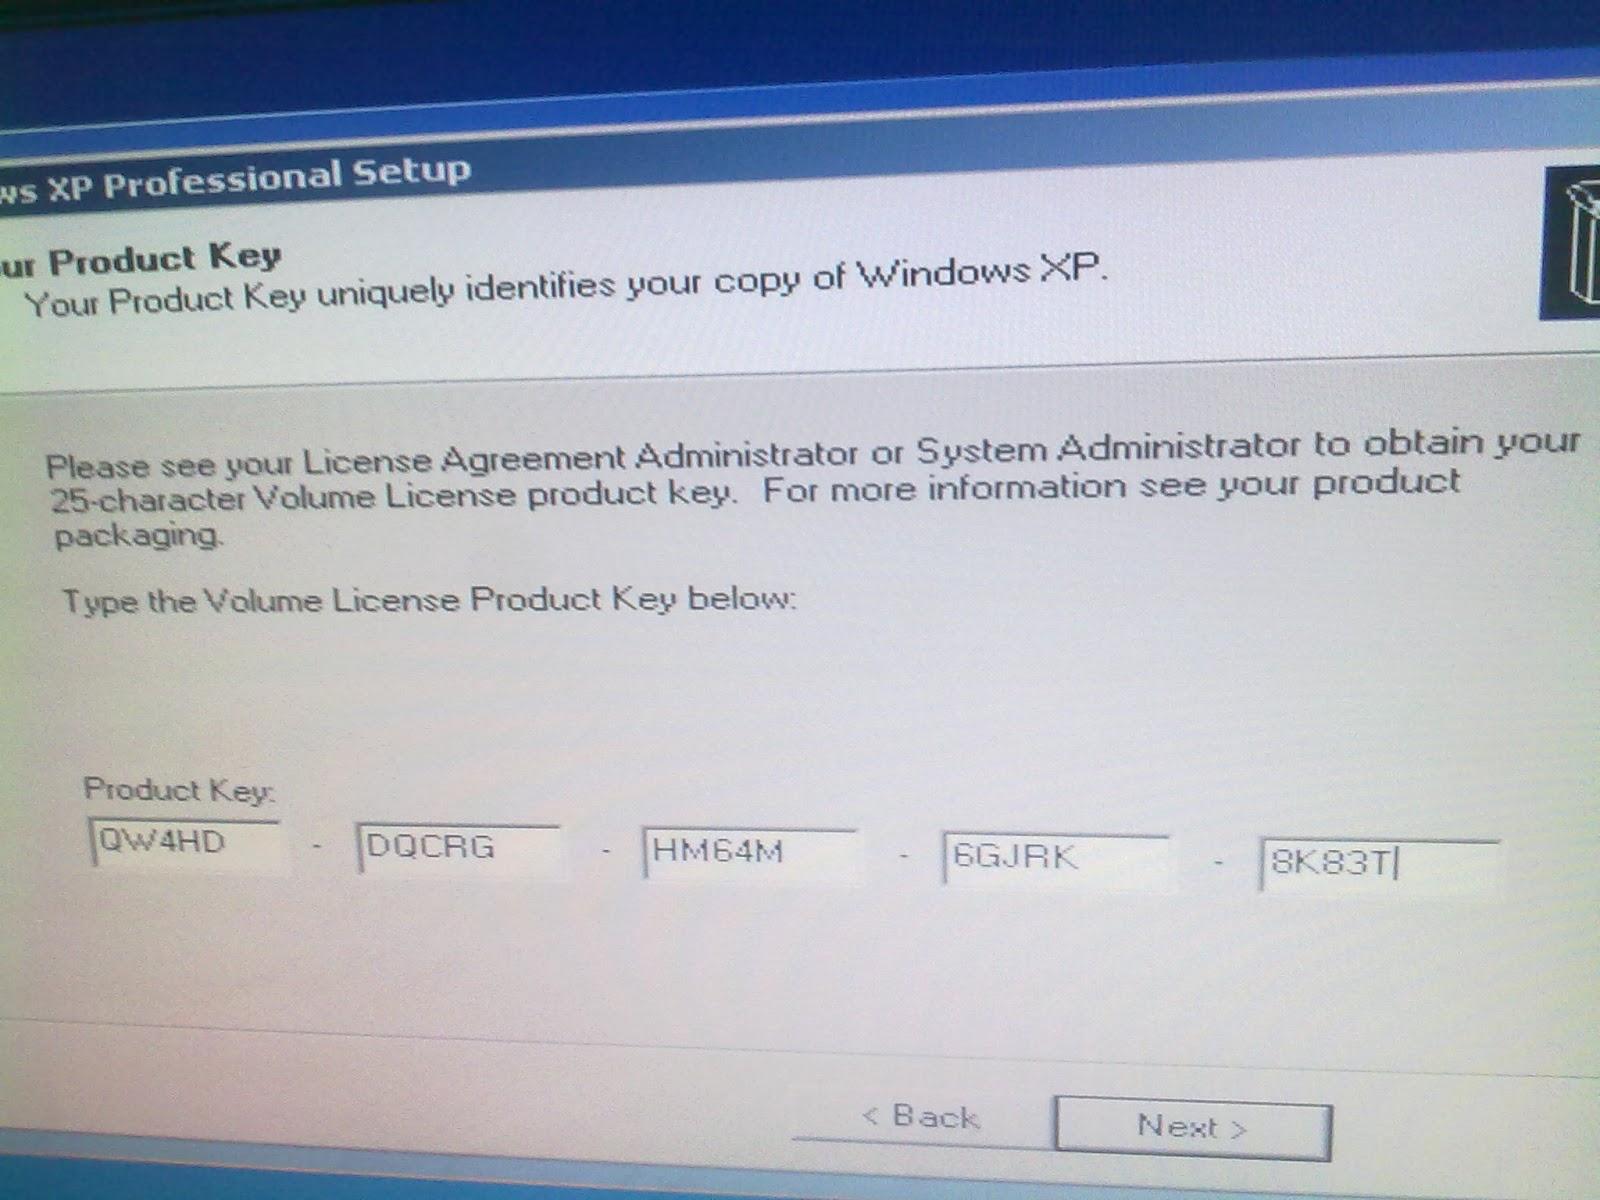 Windows: April 2015